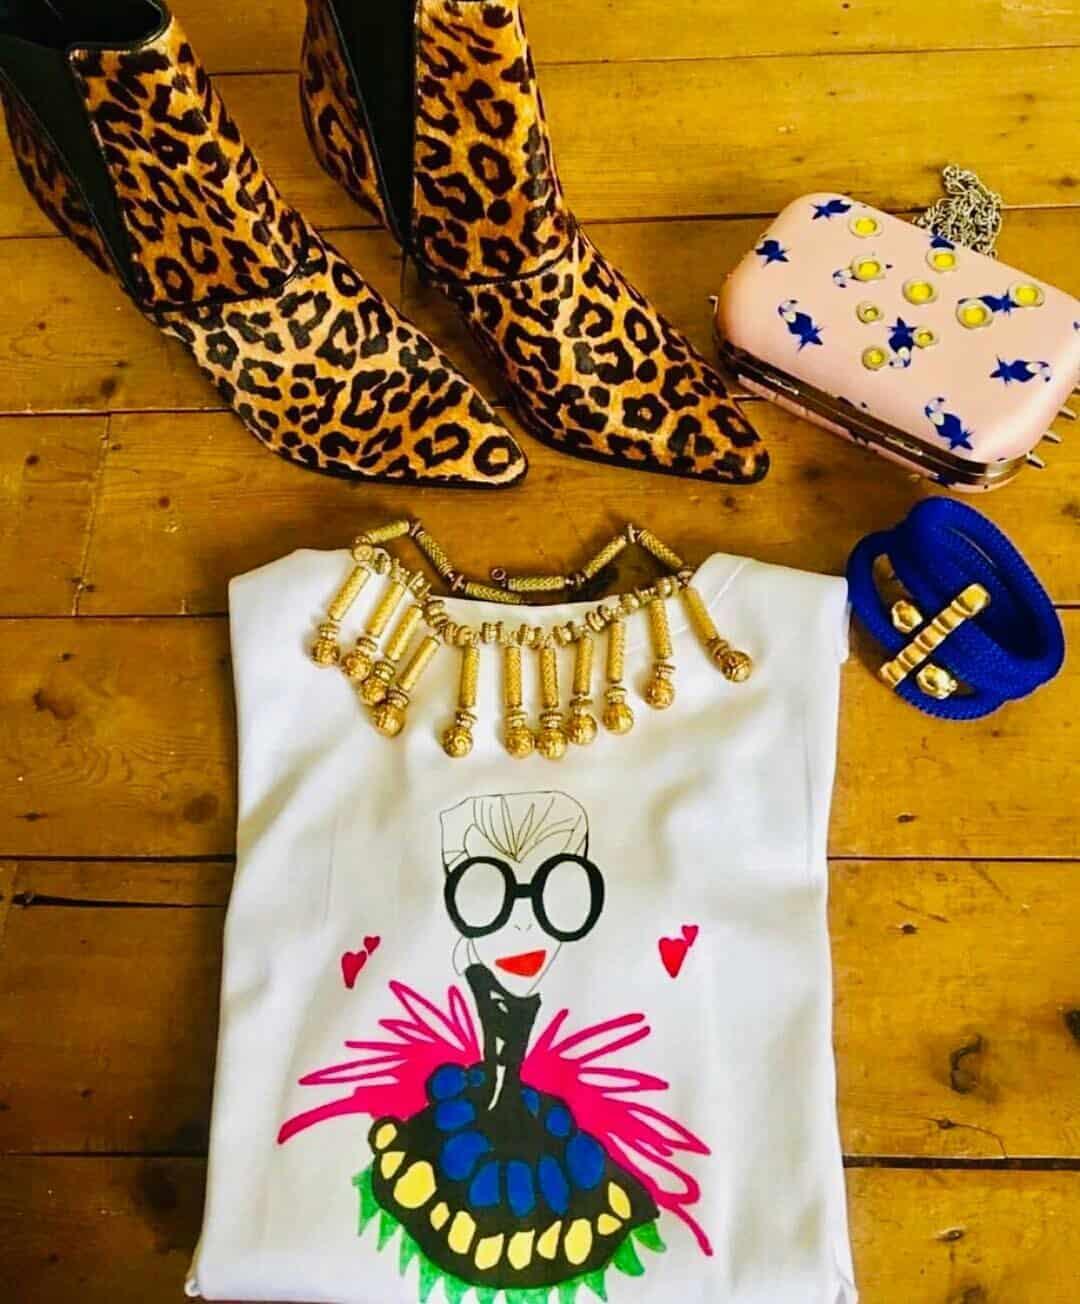 87a2133bb Gina Potter Iris Apfel T-Shirt - Ivory Lane